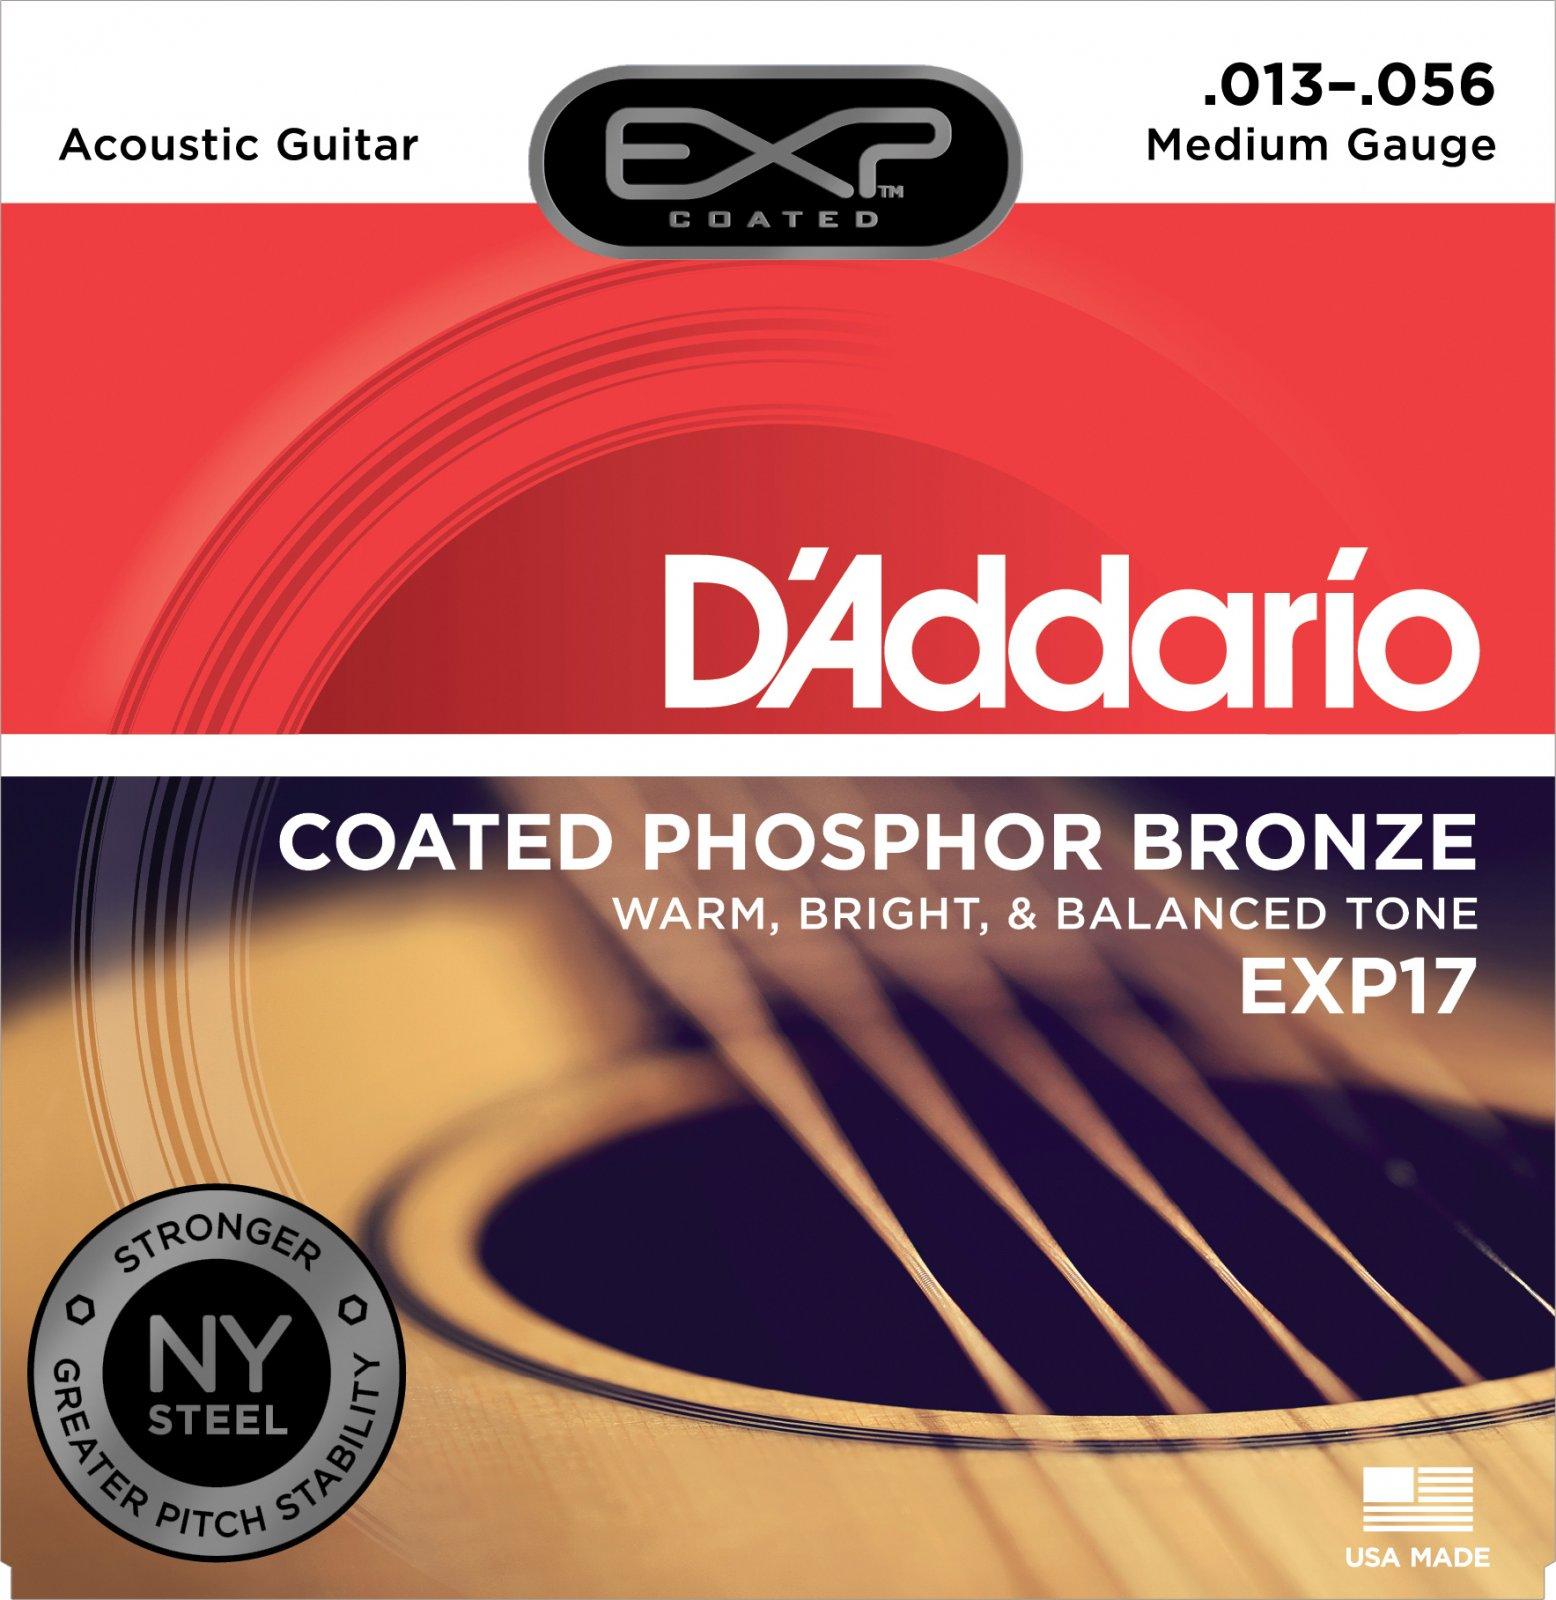 D'Addario EXP17 Coated Phosphor Acoustic Guitar Strings Medium 13-56 Set